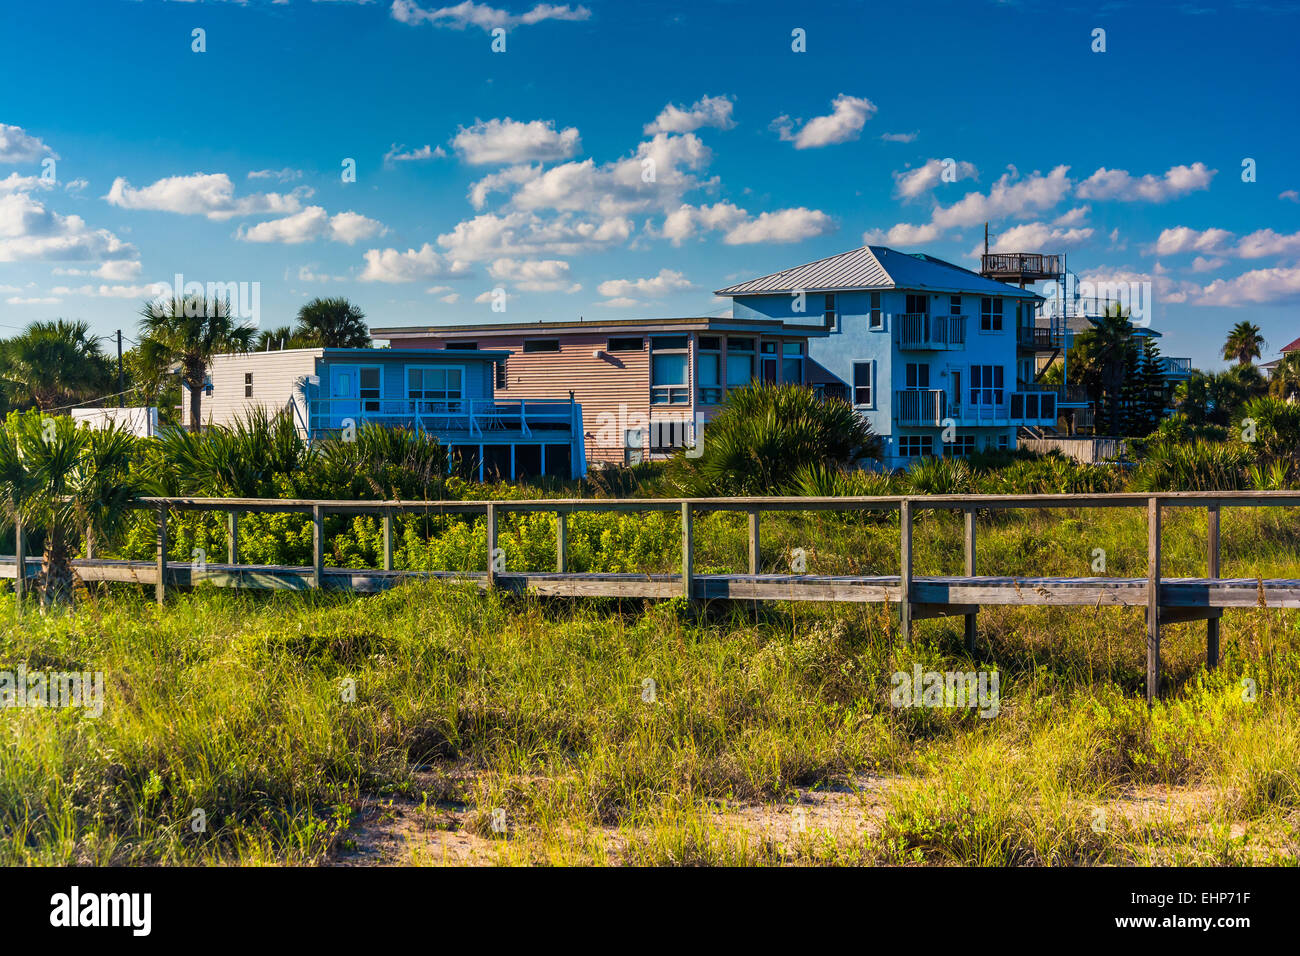 Bridge over dune grasses and beach houses in Vilano Beach, Florida. - Stock Image